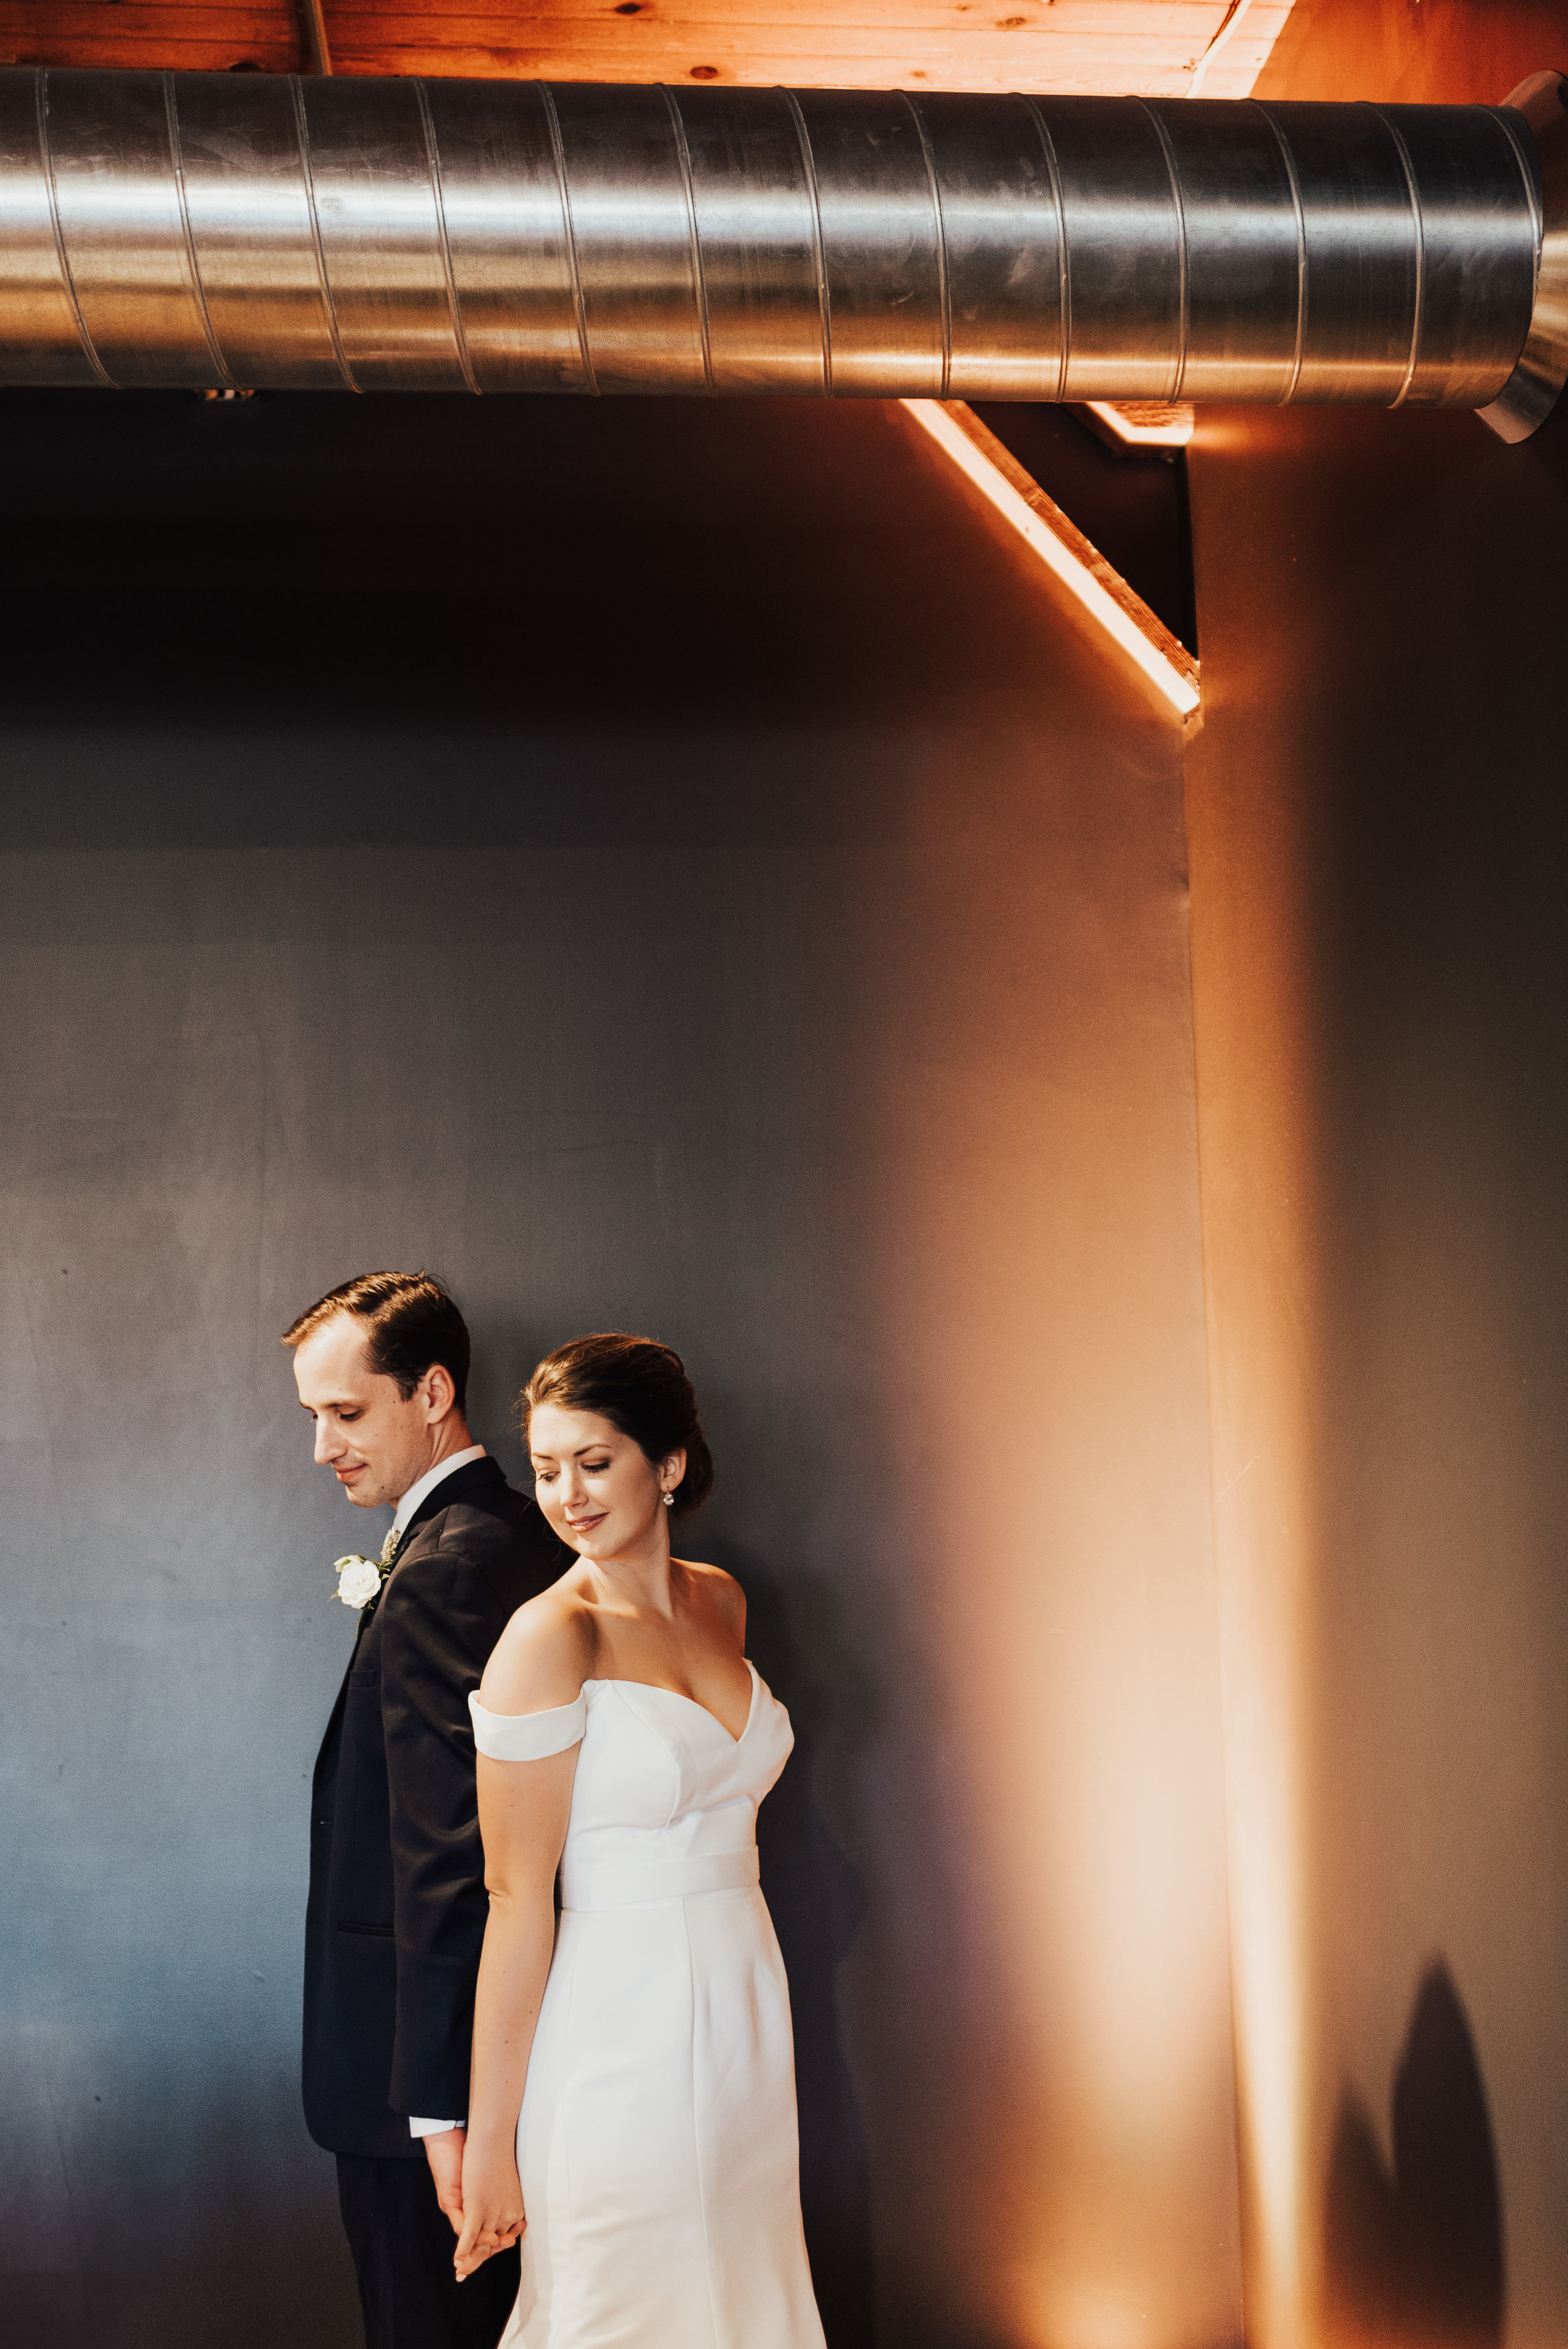 Solar-Arts-Wedding-Minneapolis-Steena-Anne-Photography34.jpg